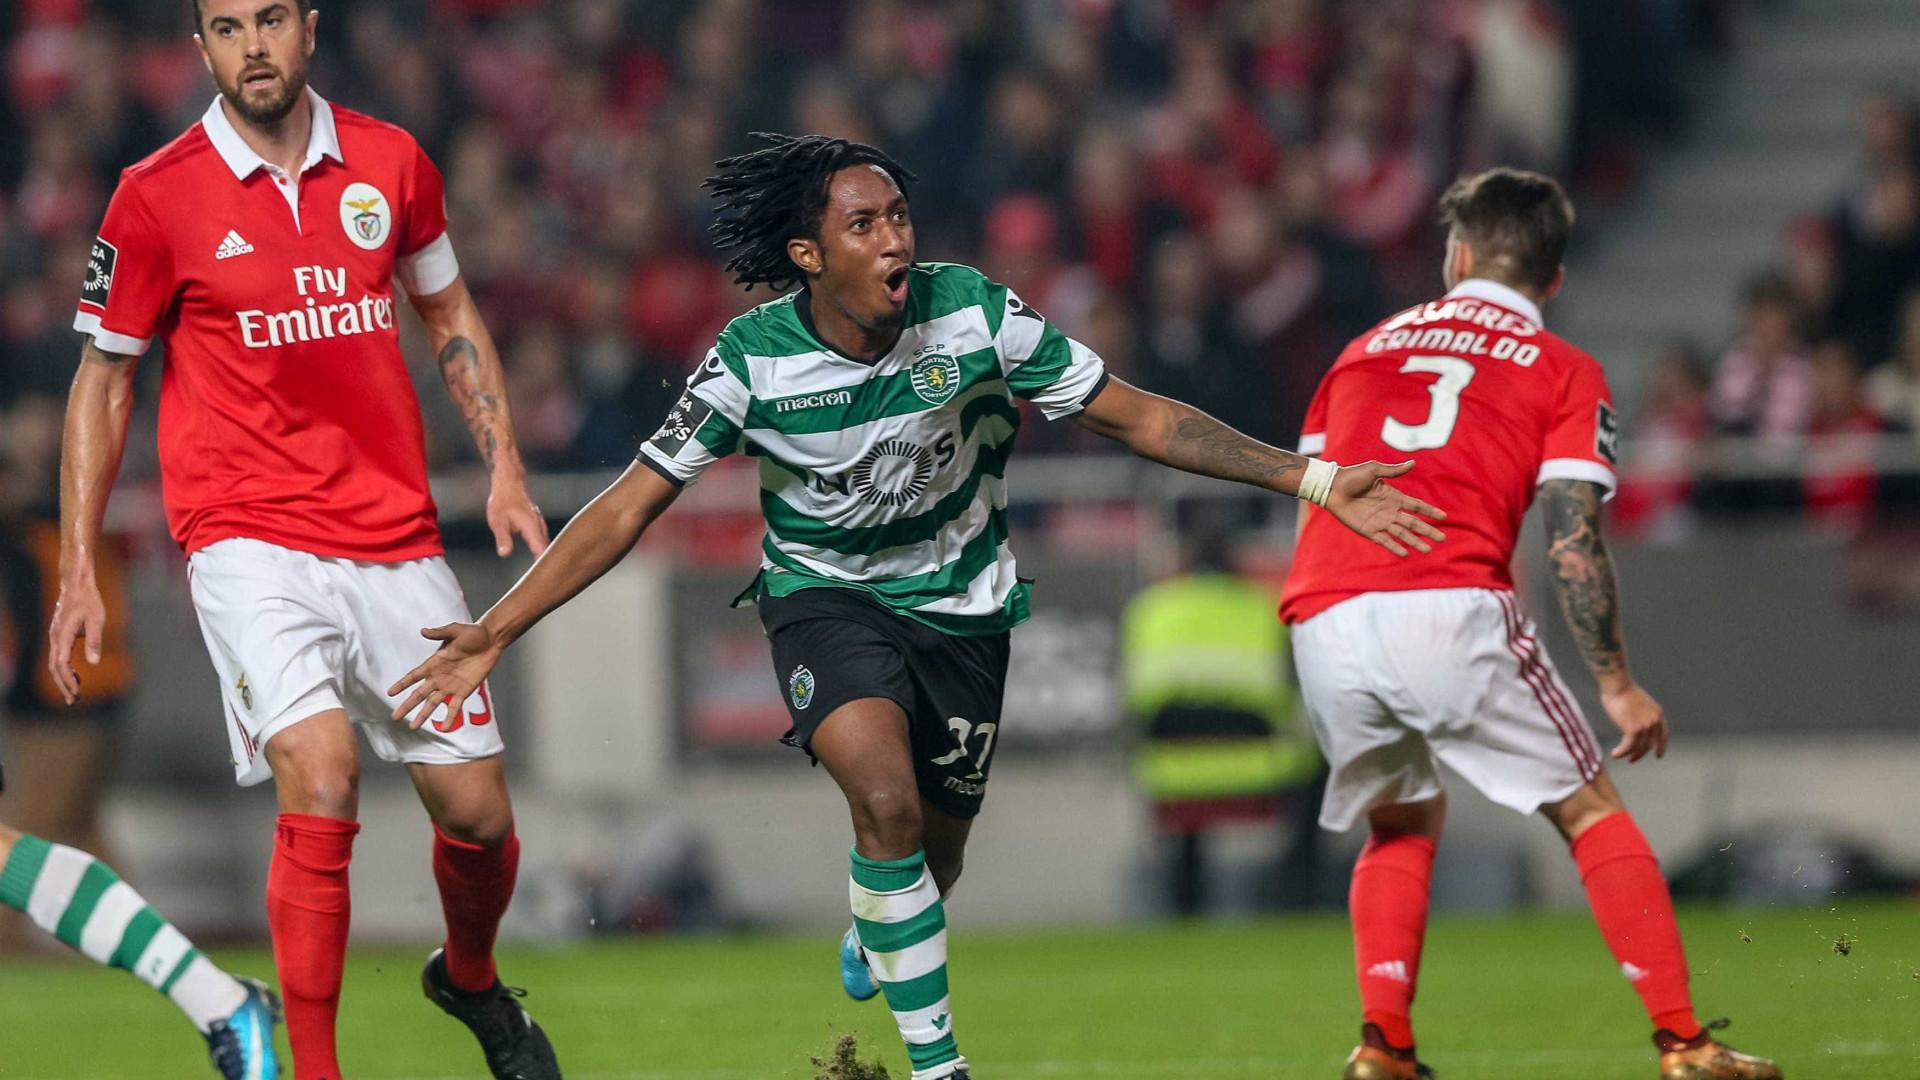 Bayern tem observado Gelson e pode avançar com proposta formal